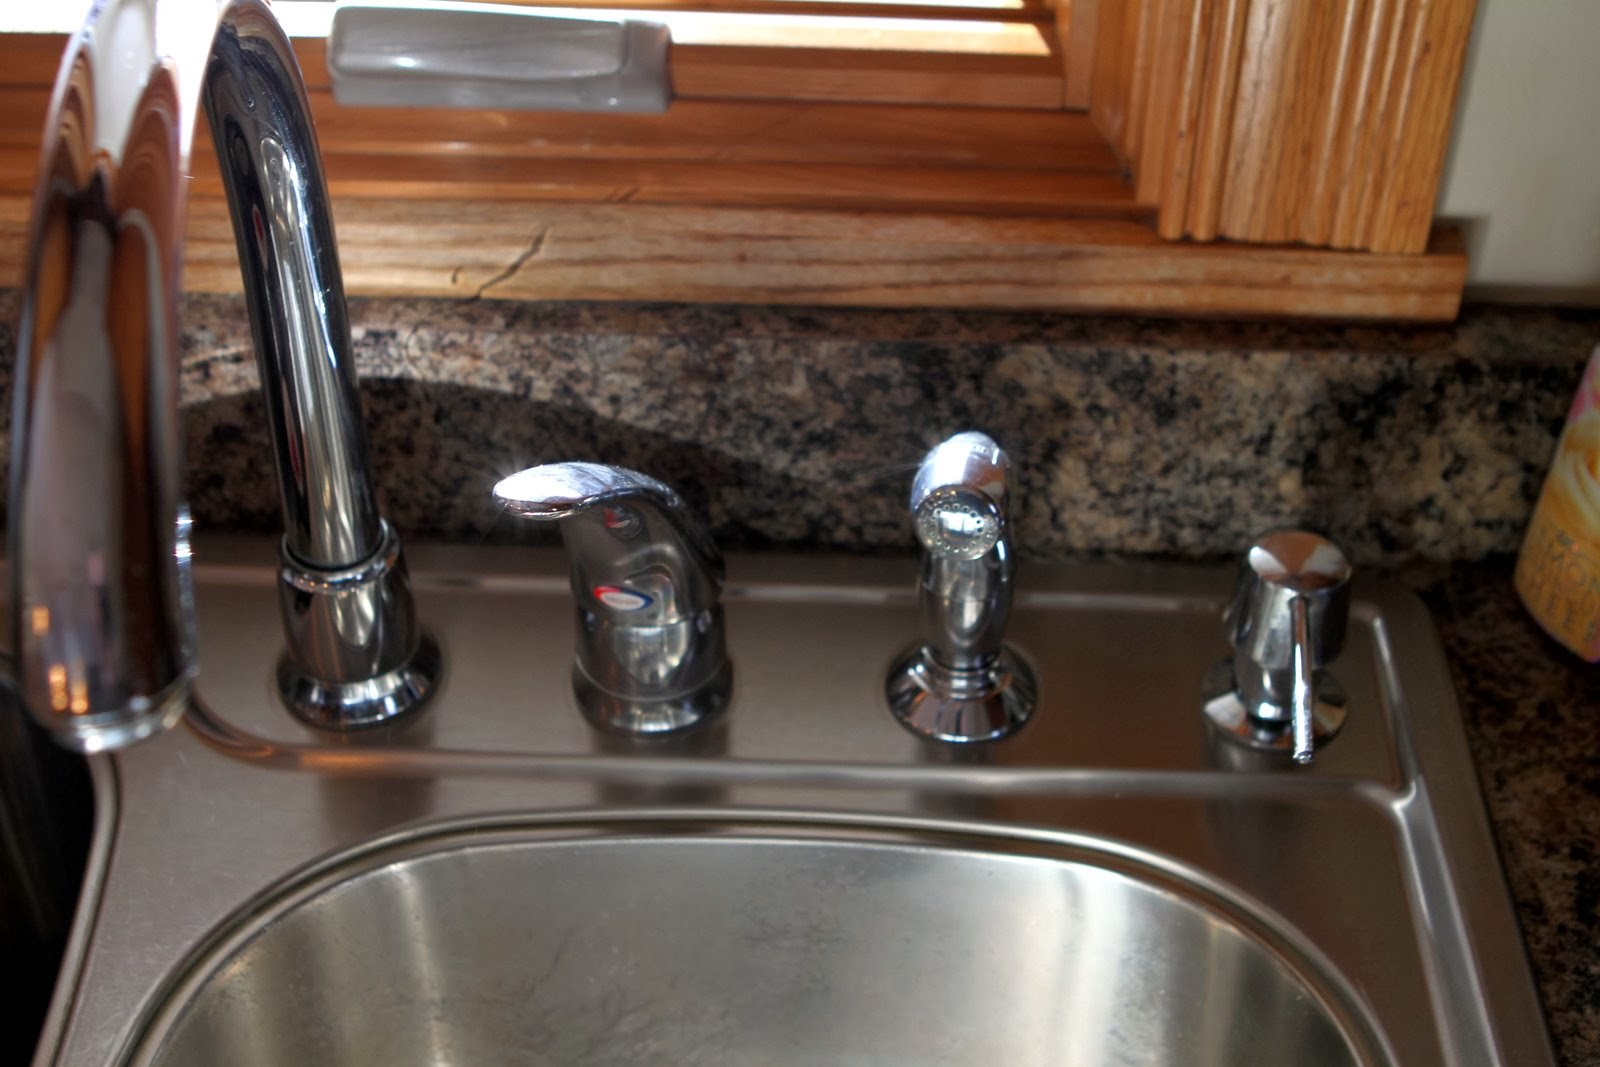 moen 1225 kitchen faucet cartridge